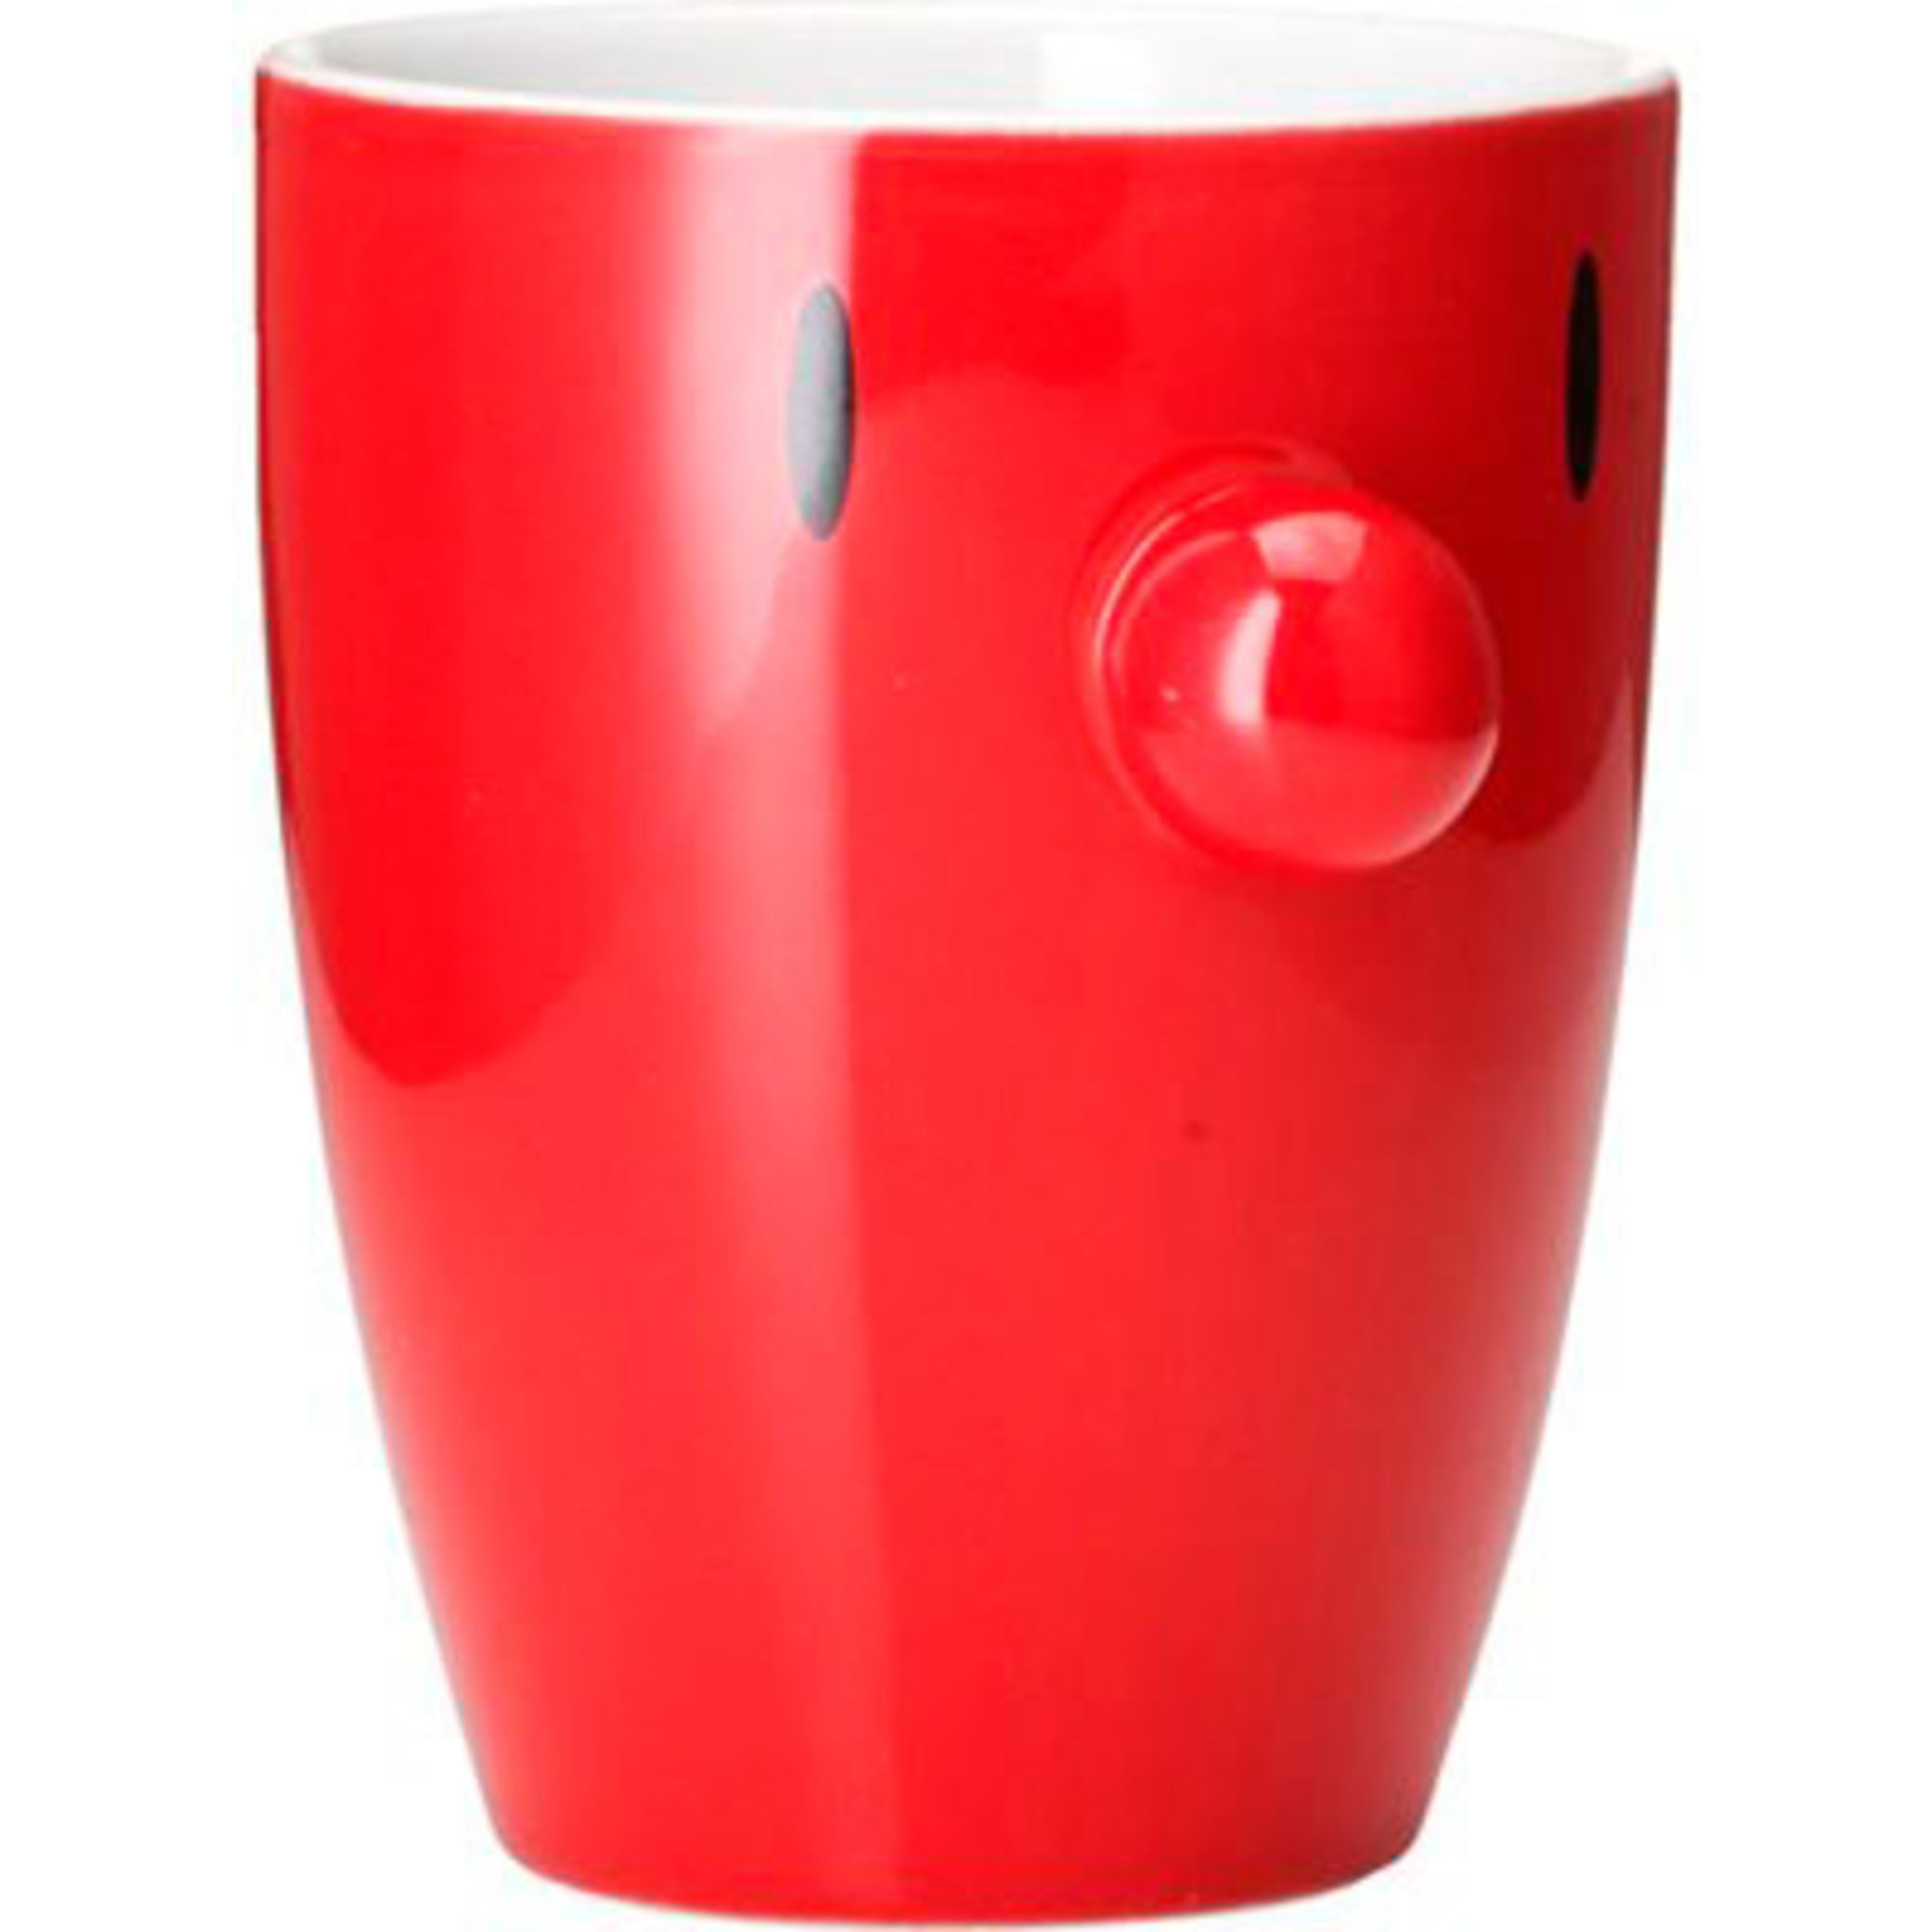 Hoptimist Termosmugg, 2 st, Röd